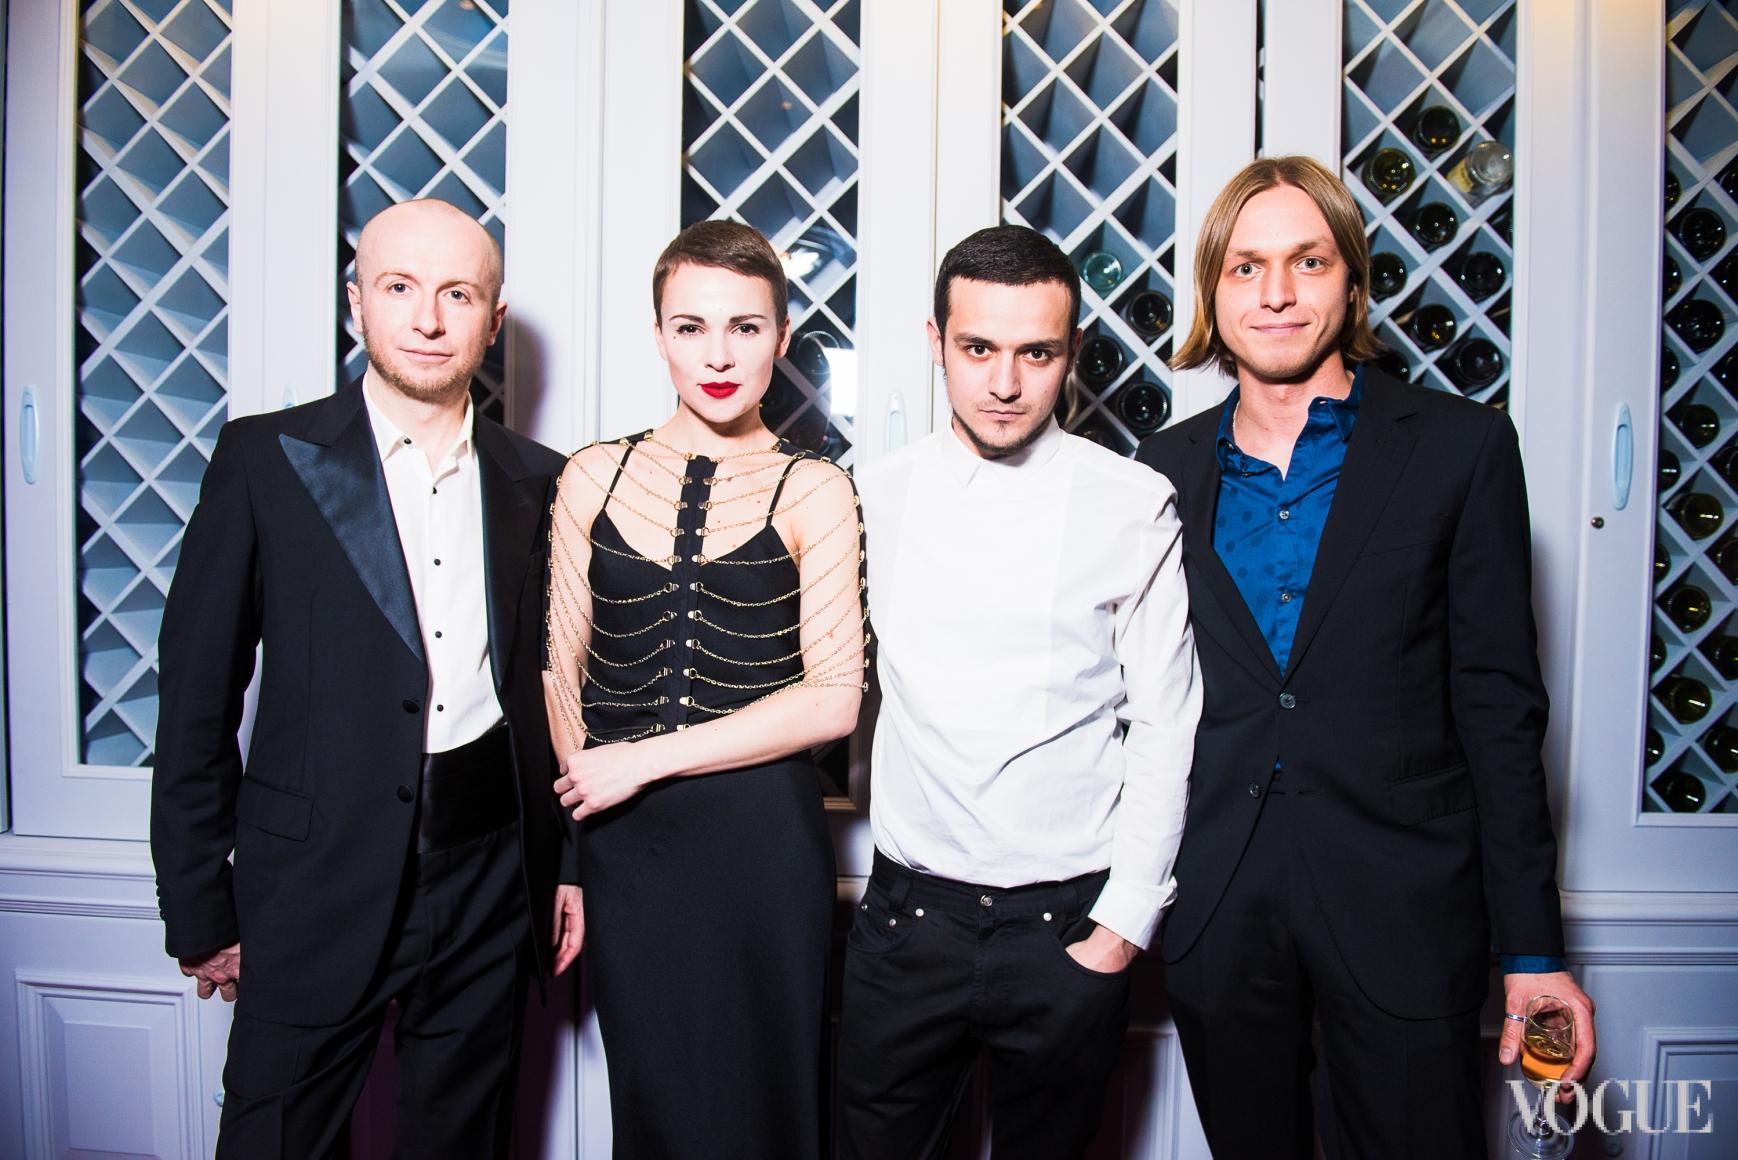 Евгений и Катя Березницкие, Али Саулиди и Евгений Примаченко